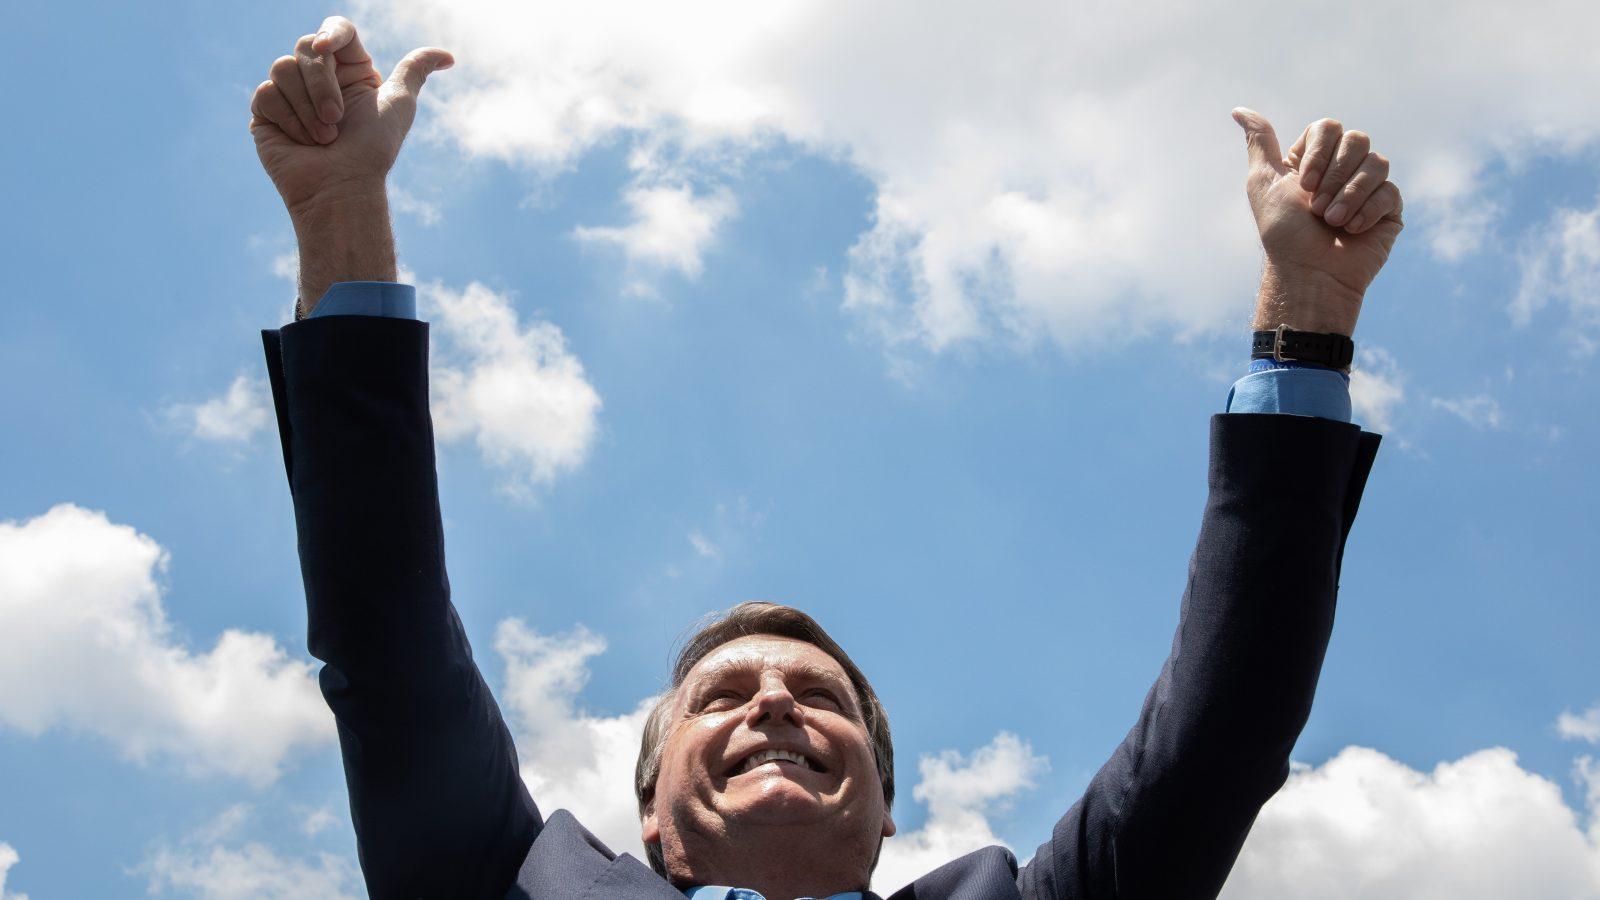 Ideas | Brazilians are challenging Bolsonaro's government using memes